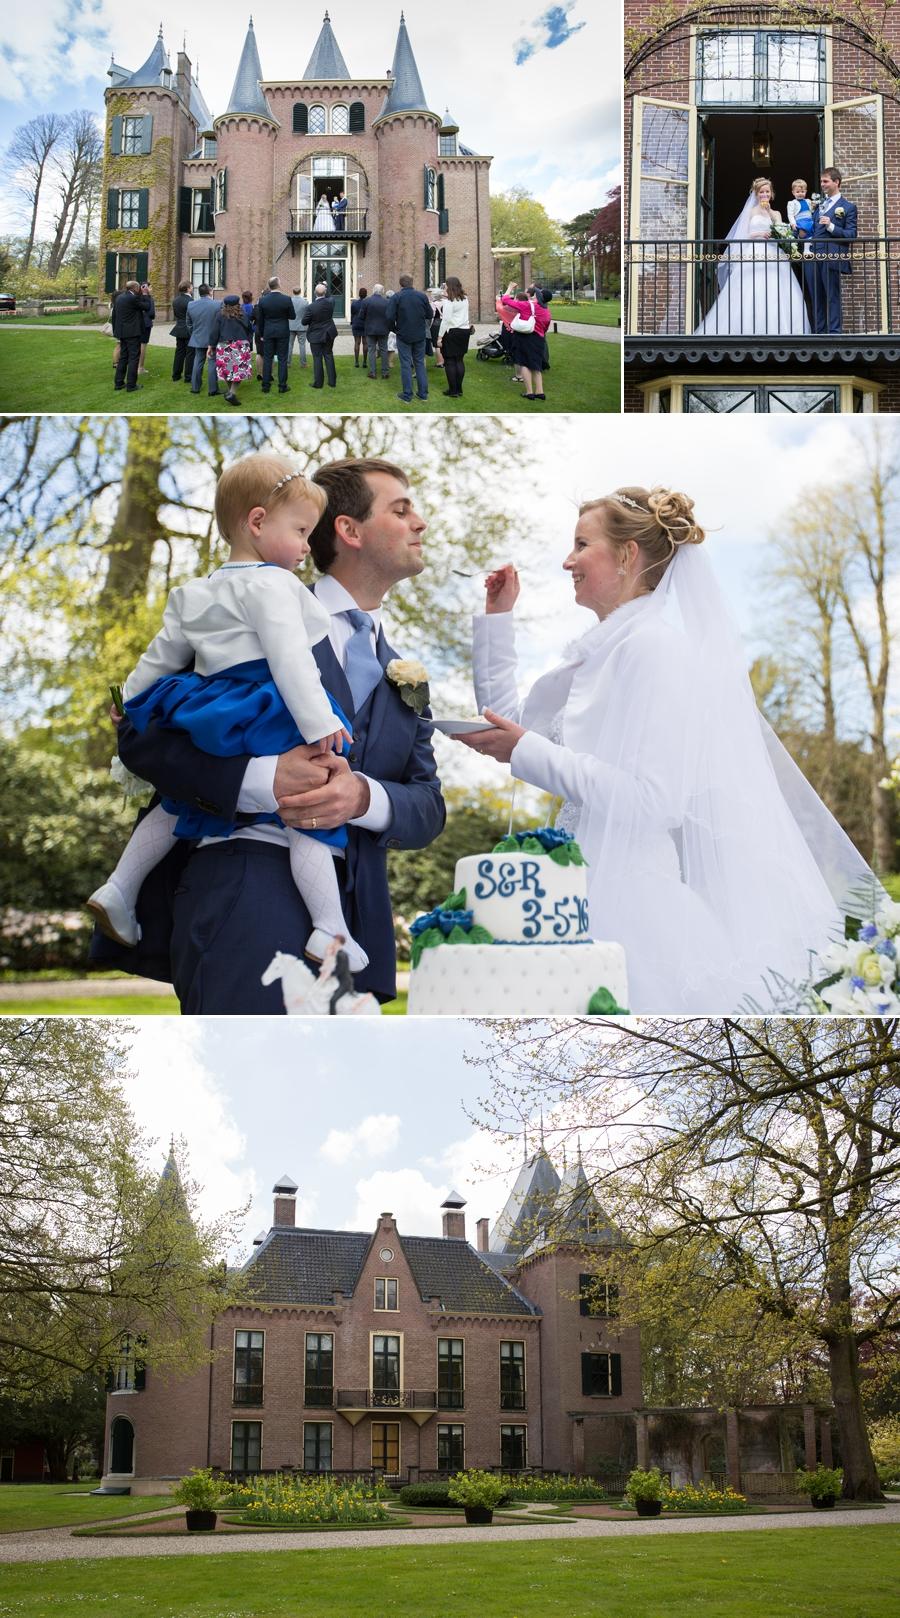 bruidsfotografie_kasteelkeukenhof-6